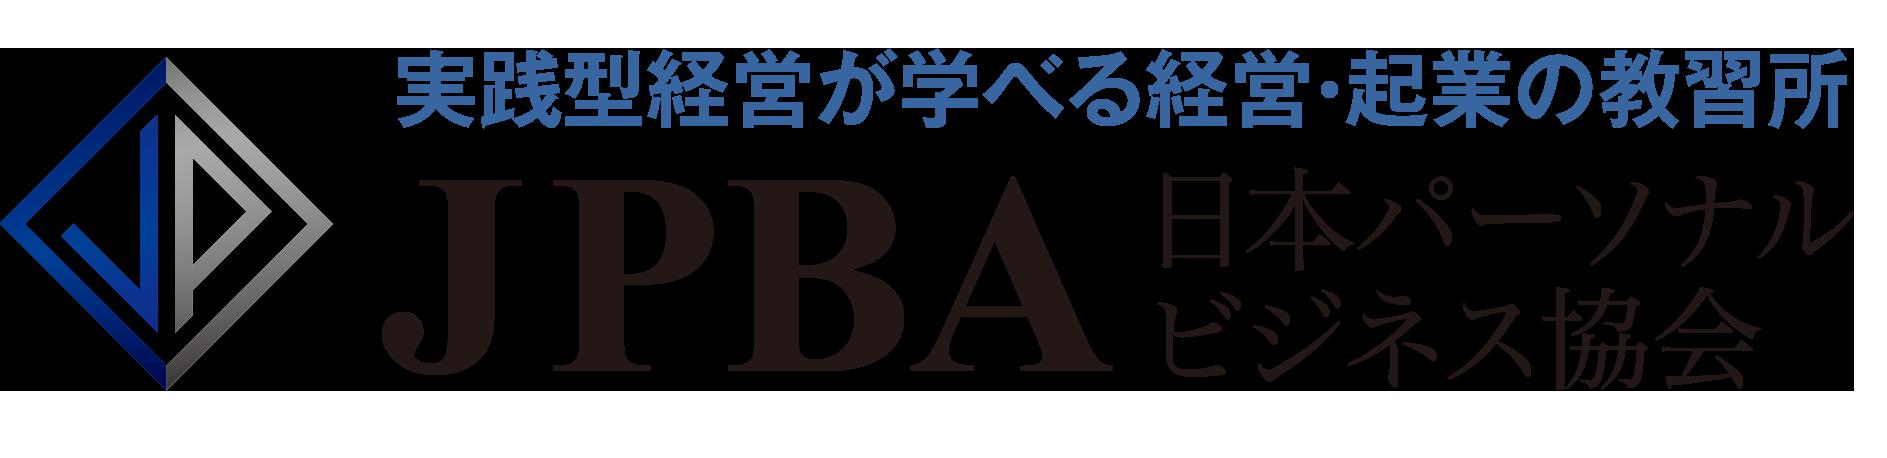 JPBA|一般社団法人 日本パーソナルビジネス協会|業務のオンライン化・テレワーク時代の人材育成・オンライン集客などアフターコロナ時代に対応する会社・事業者・社員の経営力アップを支援!